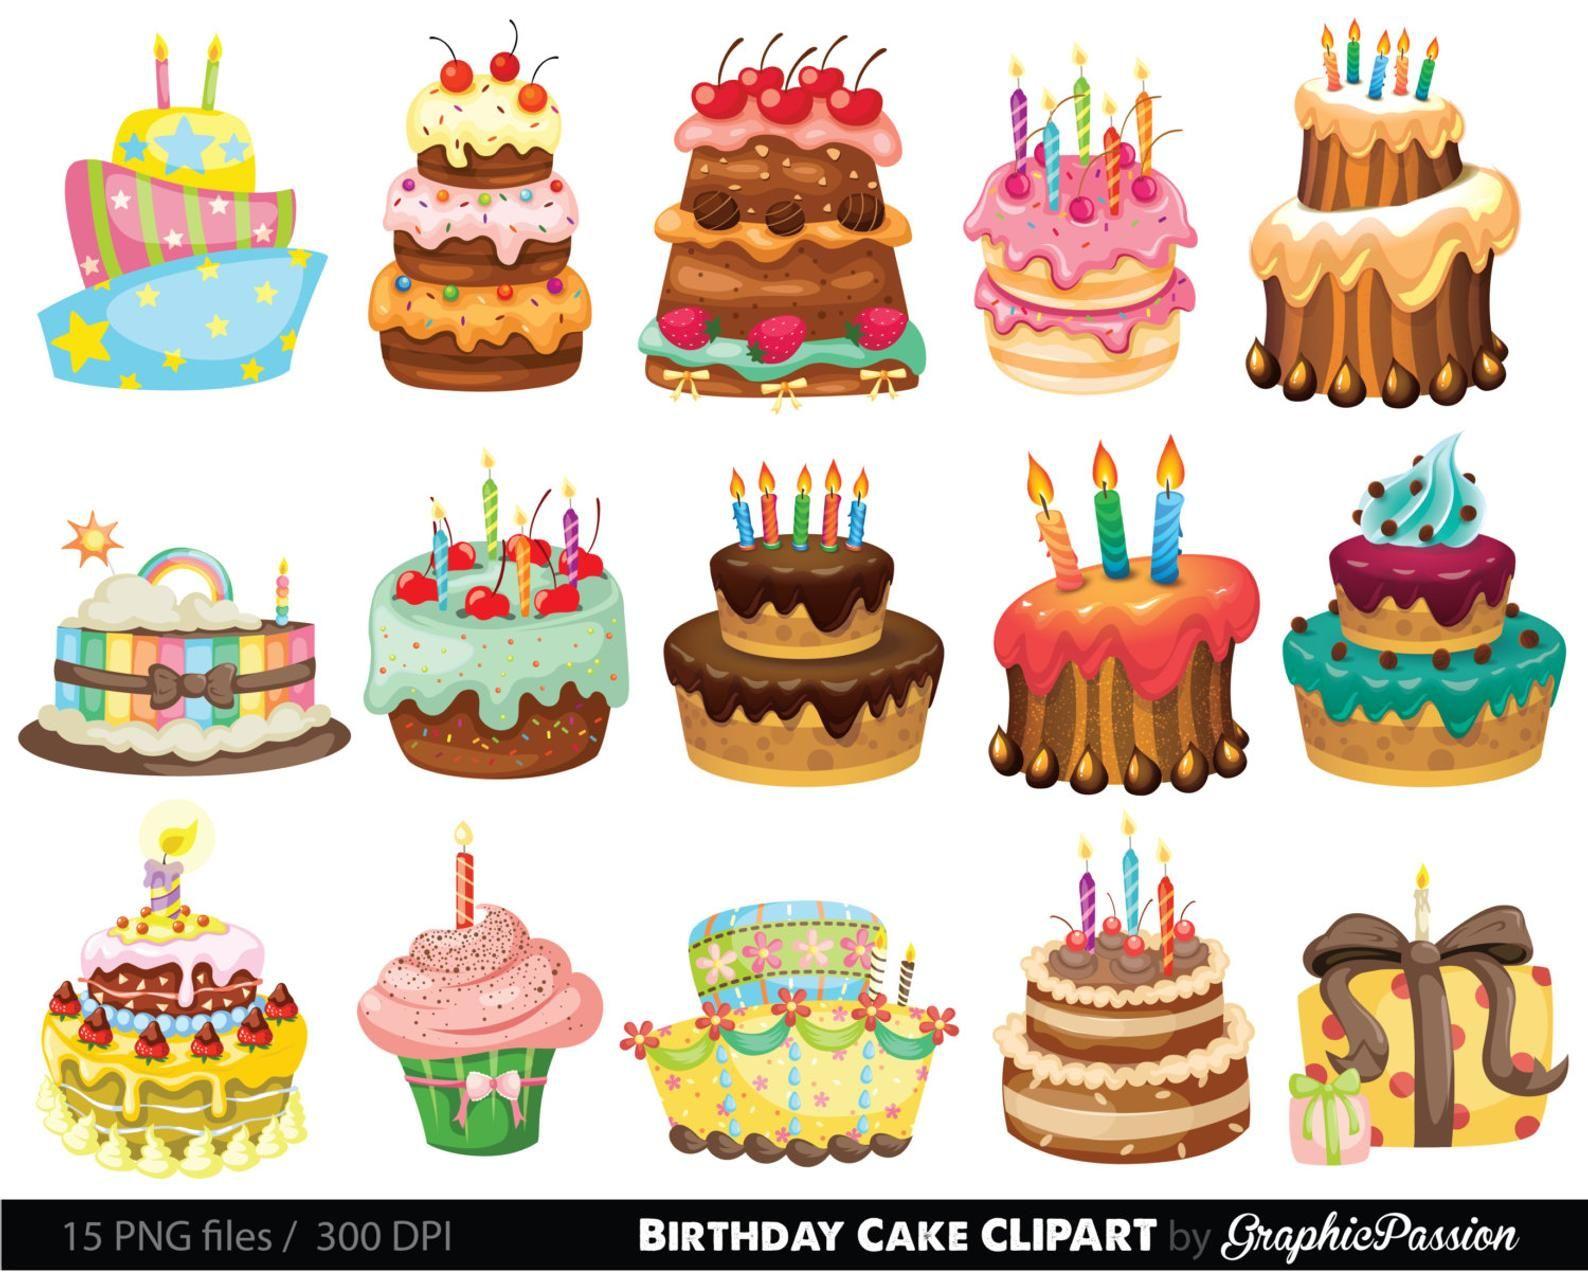 Birthday Cake Clipart Cake Illustration Birthday Cake Etsy Birthday Cake Illustration Cake Illustration Cake Drawing